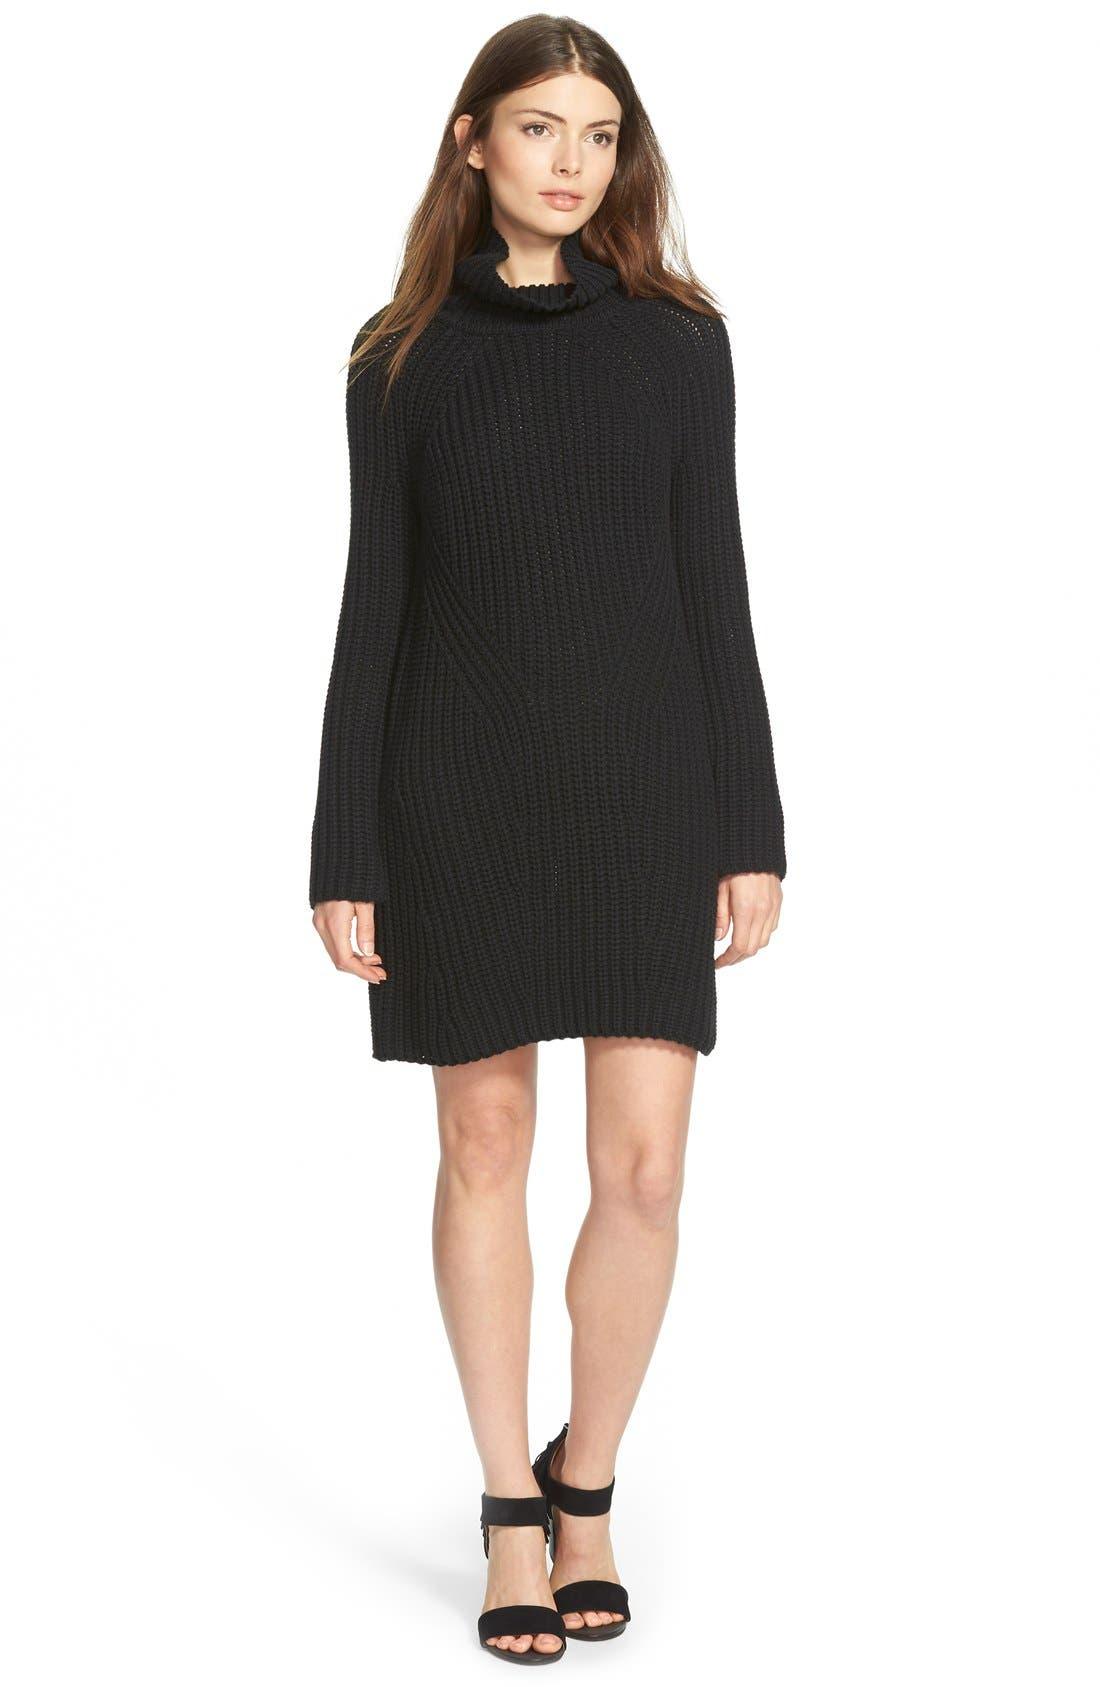 TREASURE & BOND Treasure&Bond Turtleneck Sweater Dress, Main, color, 001